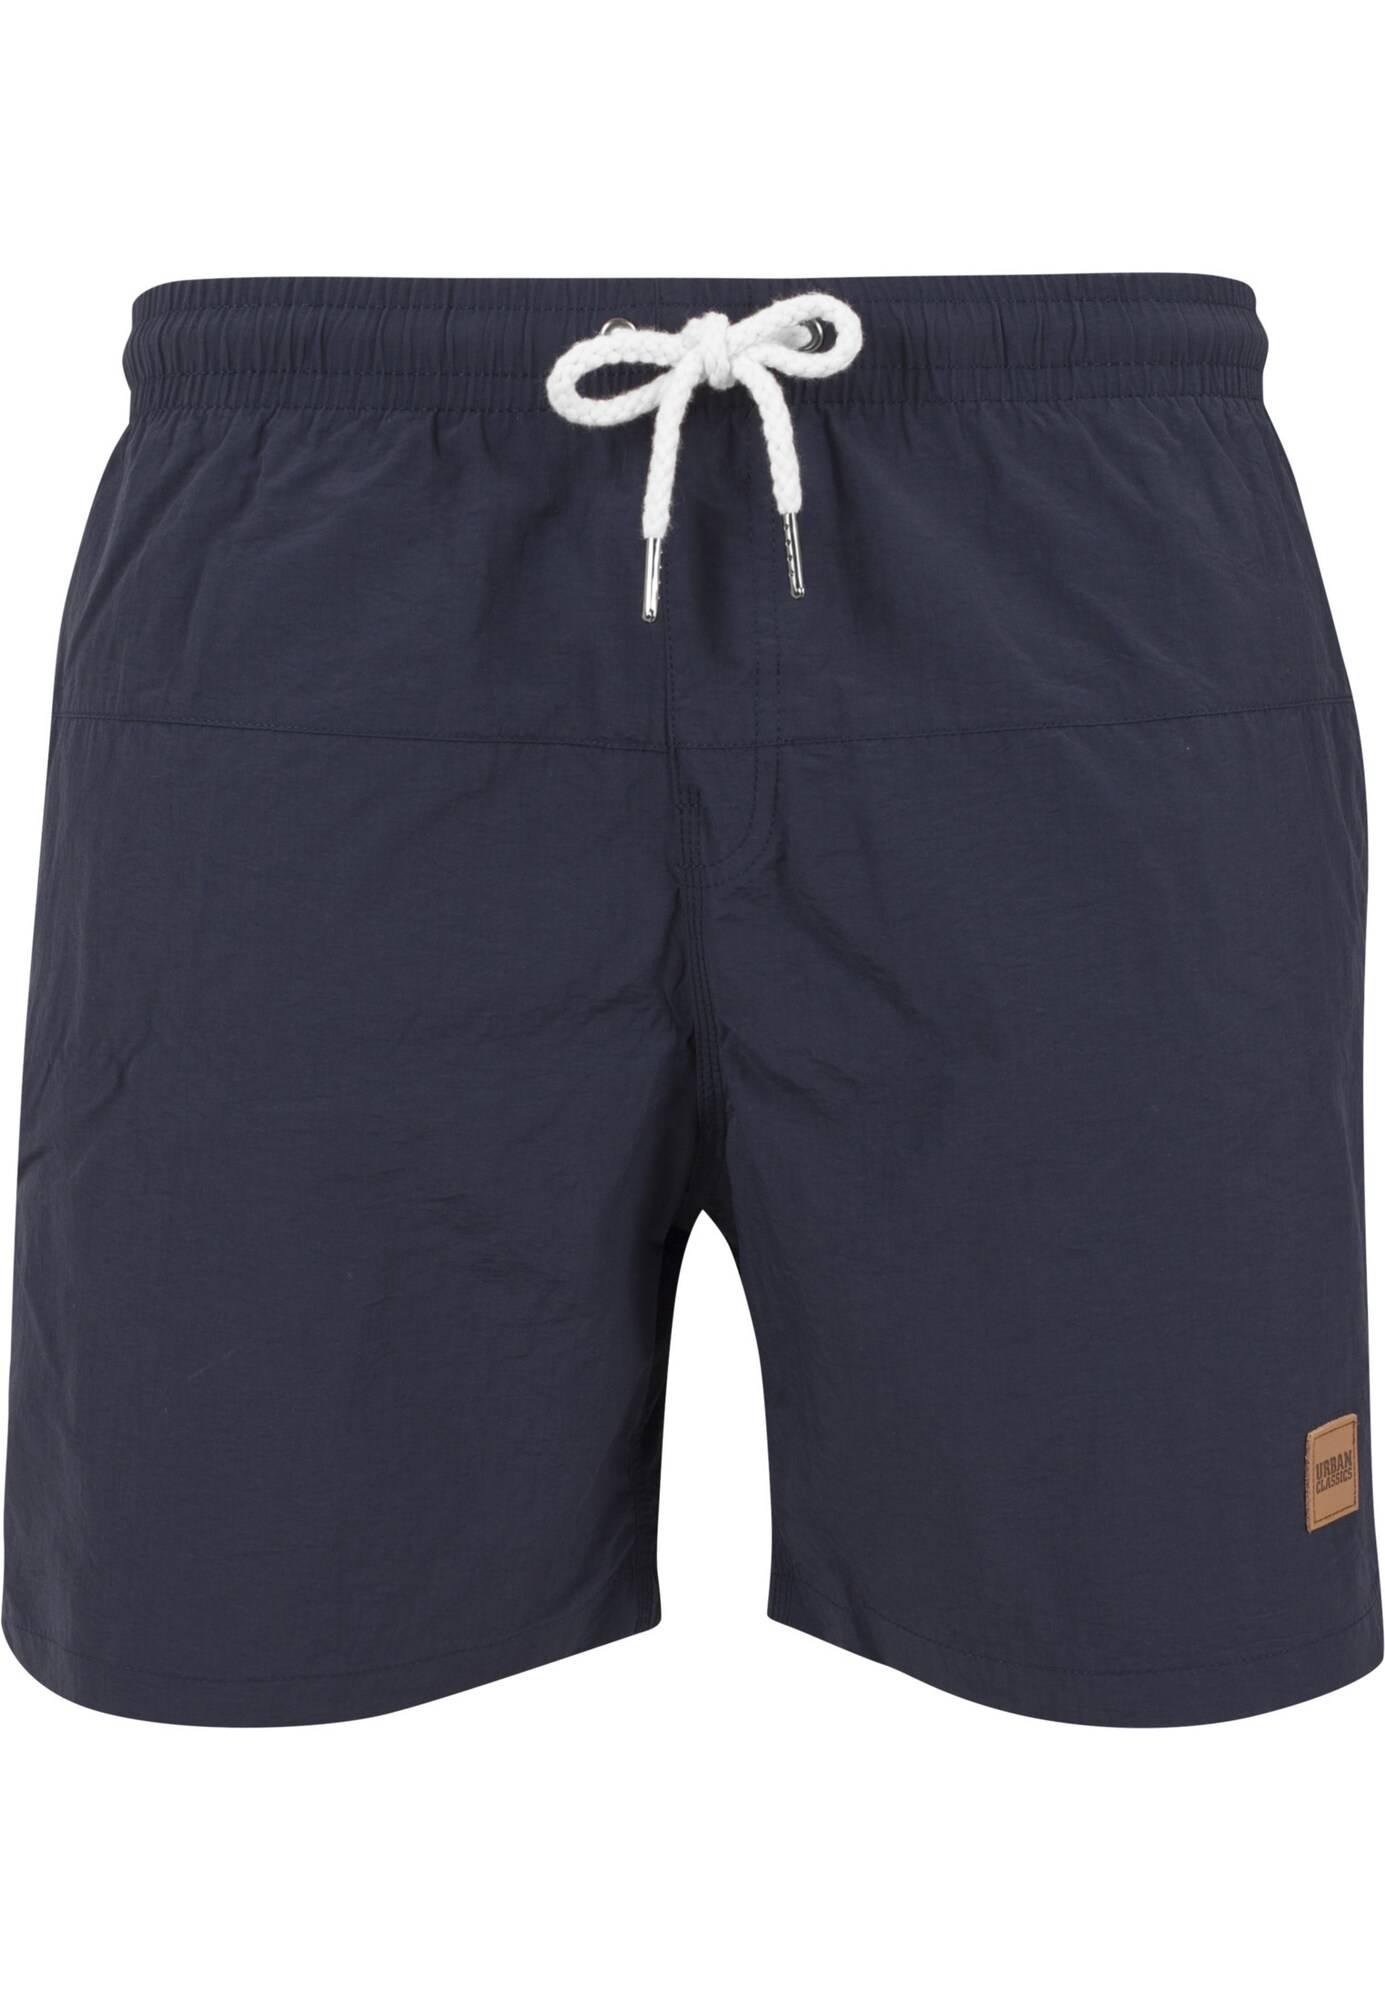 Urban Classics Shorts de bain  - Bleu - Taille: 4XL - male